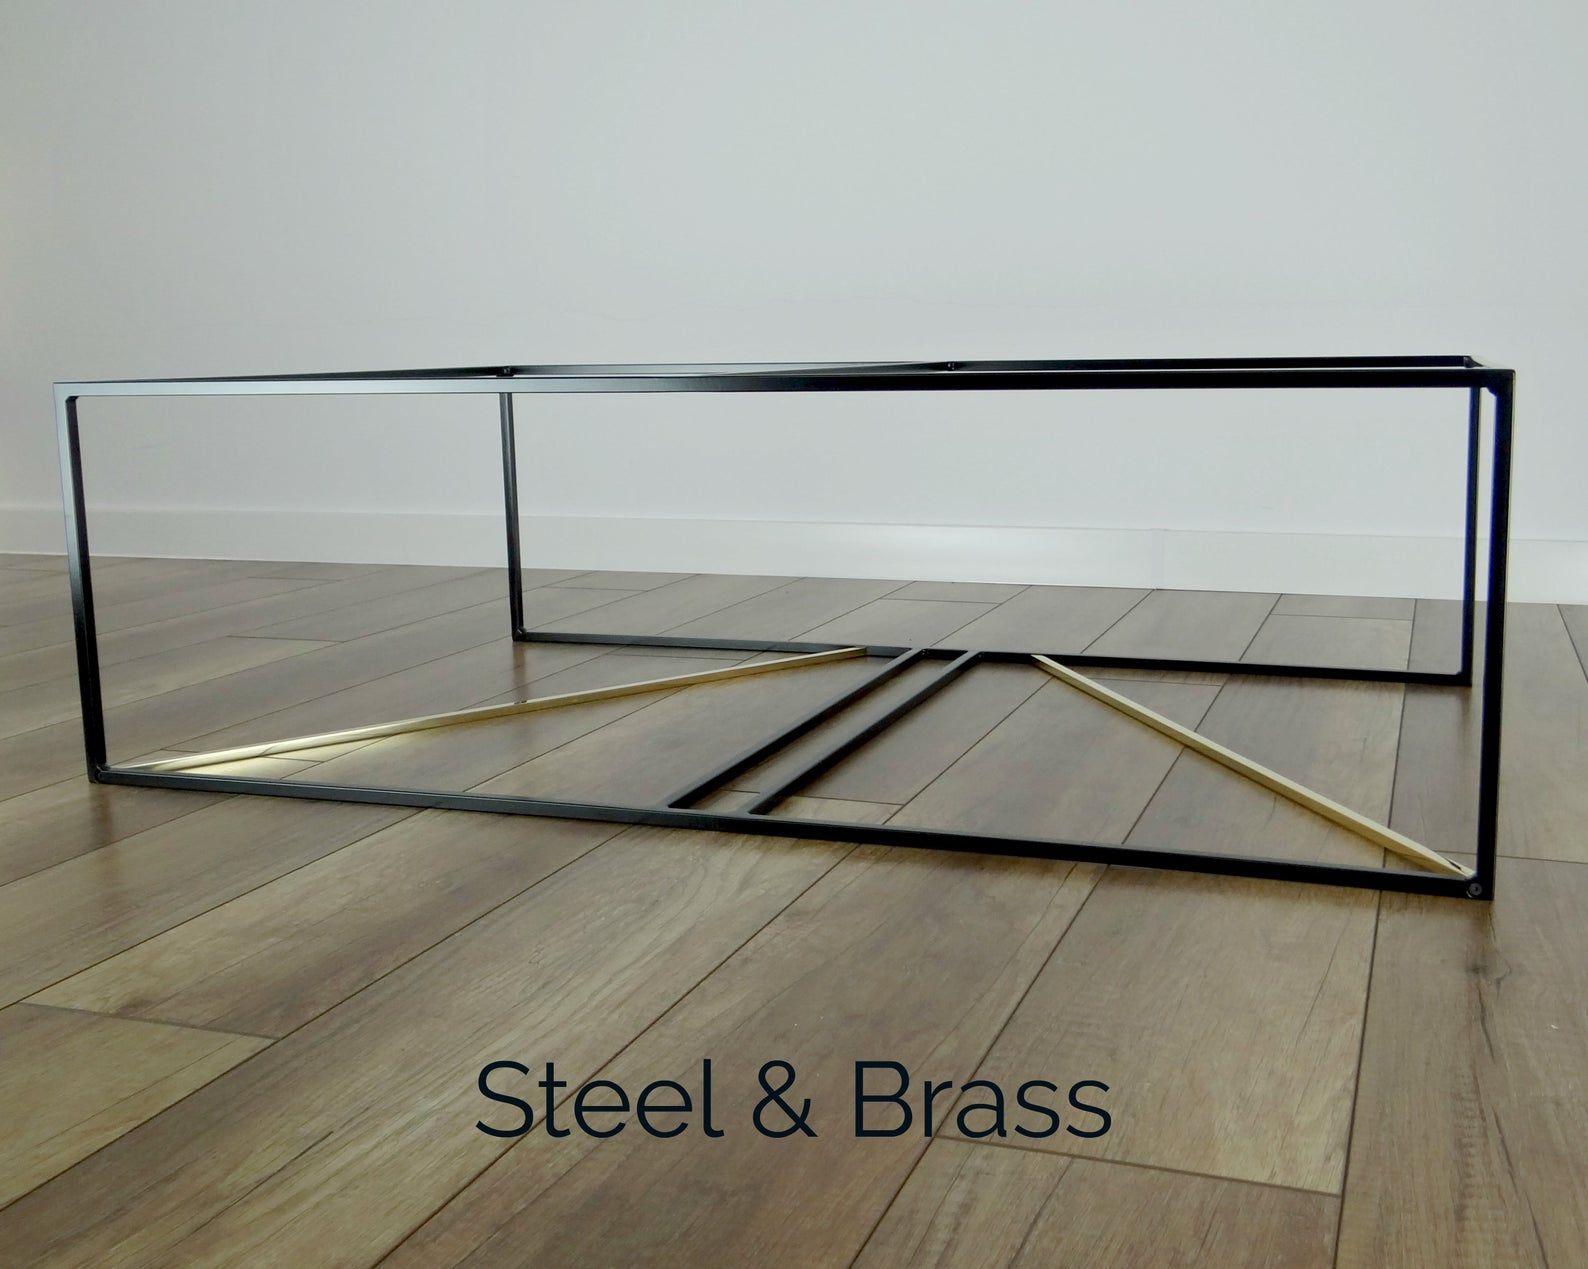 Metal Coffee Table Base 100x60cm Inka Brass And Steel Large Modern Coffee Table Base Black Coffee Table Frame Coffee Table Coffee Table Frame Metal Coffee Table